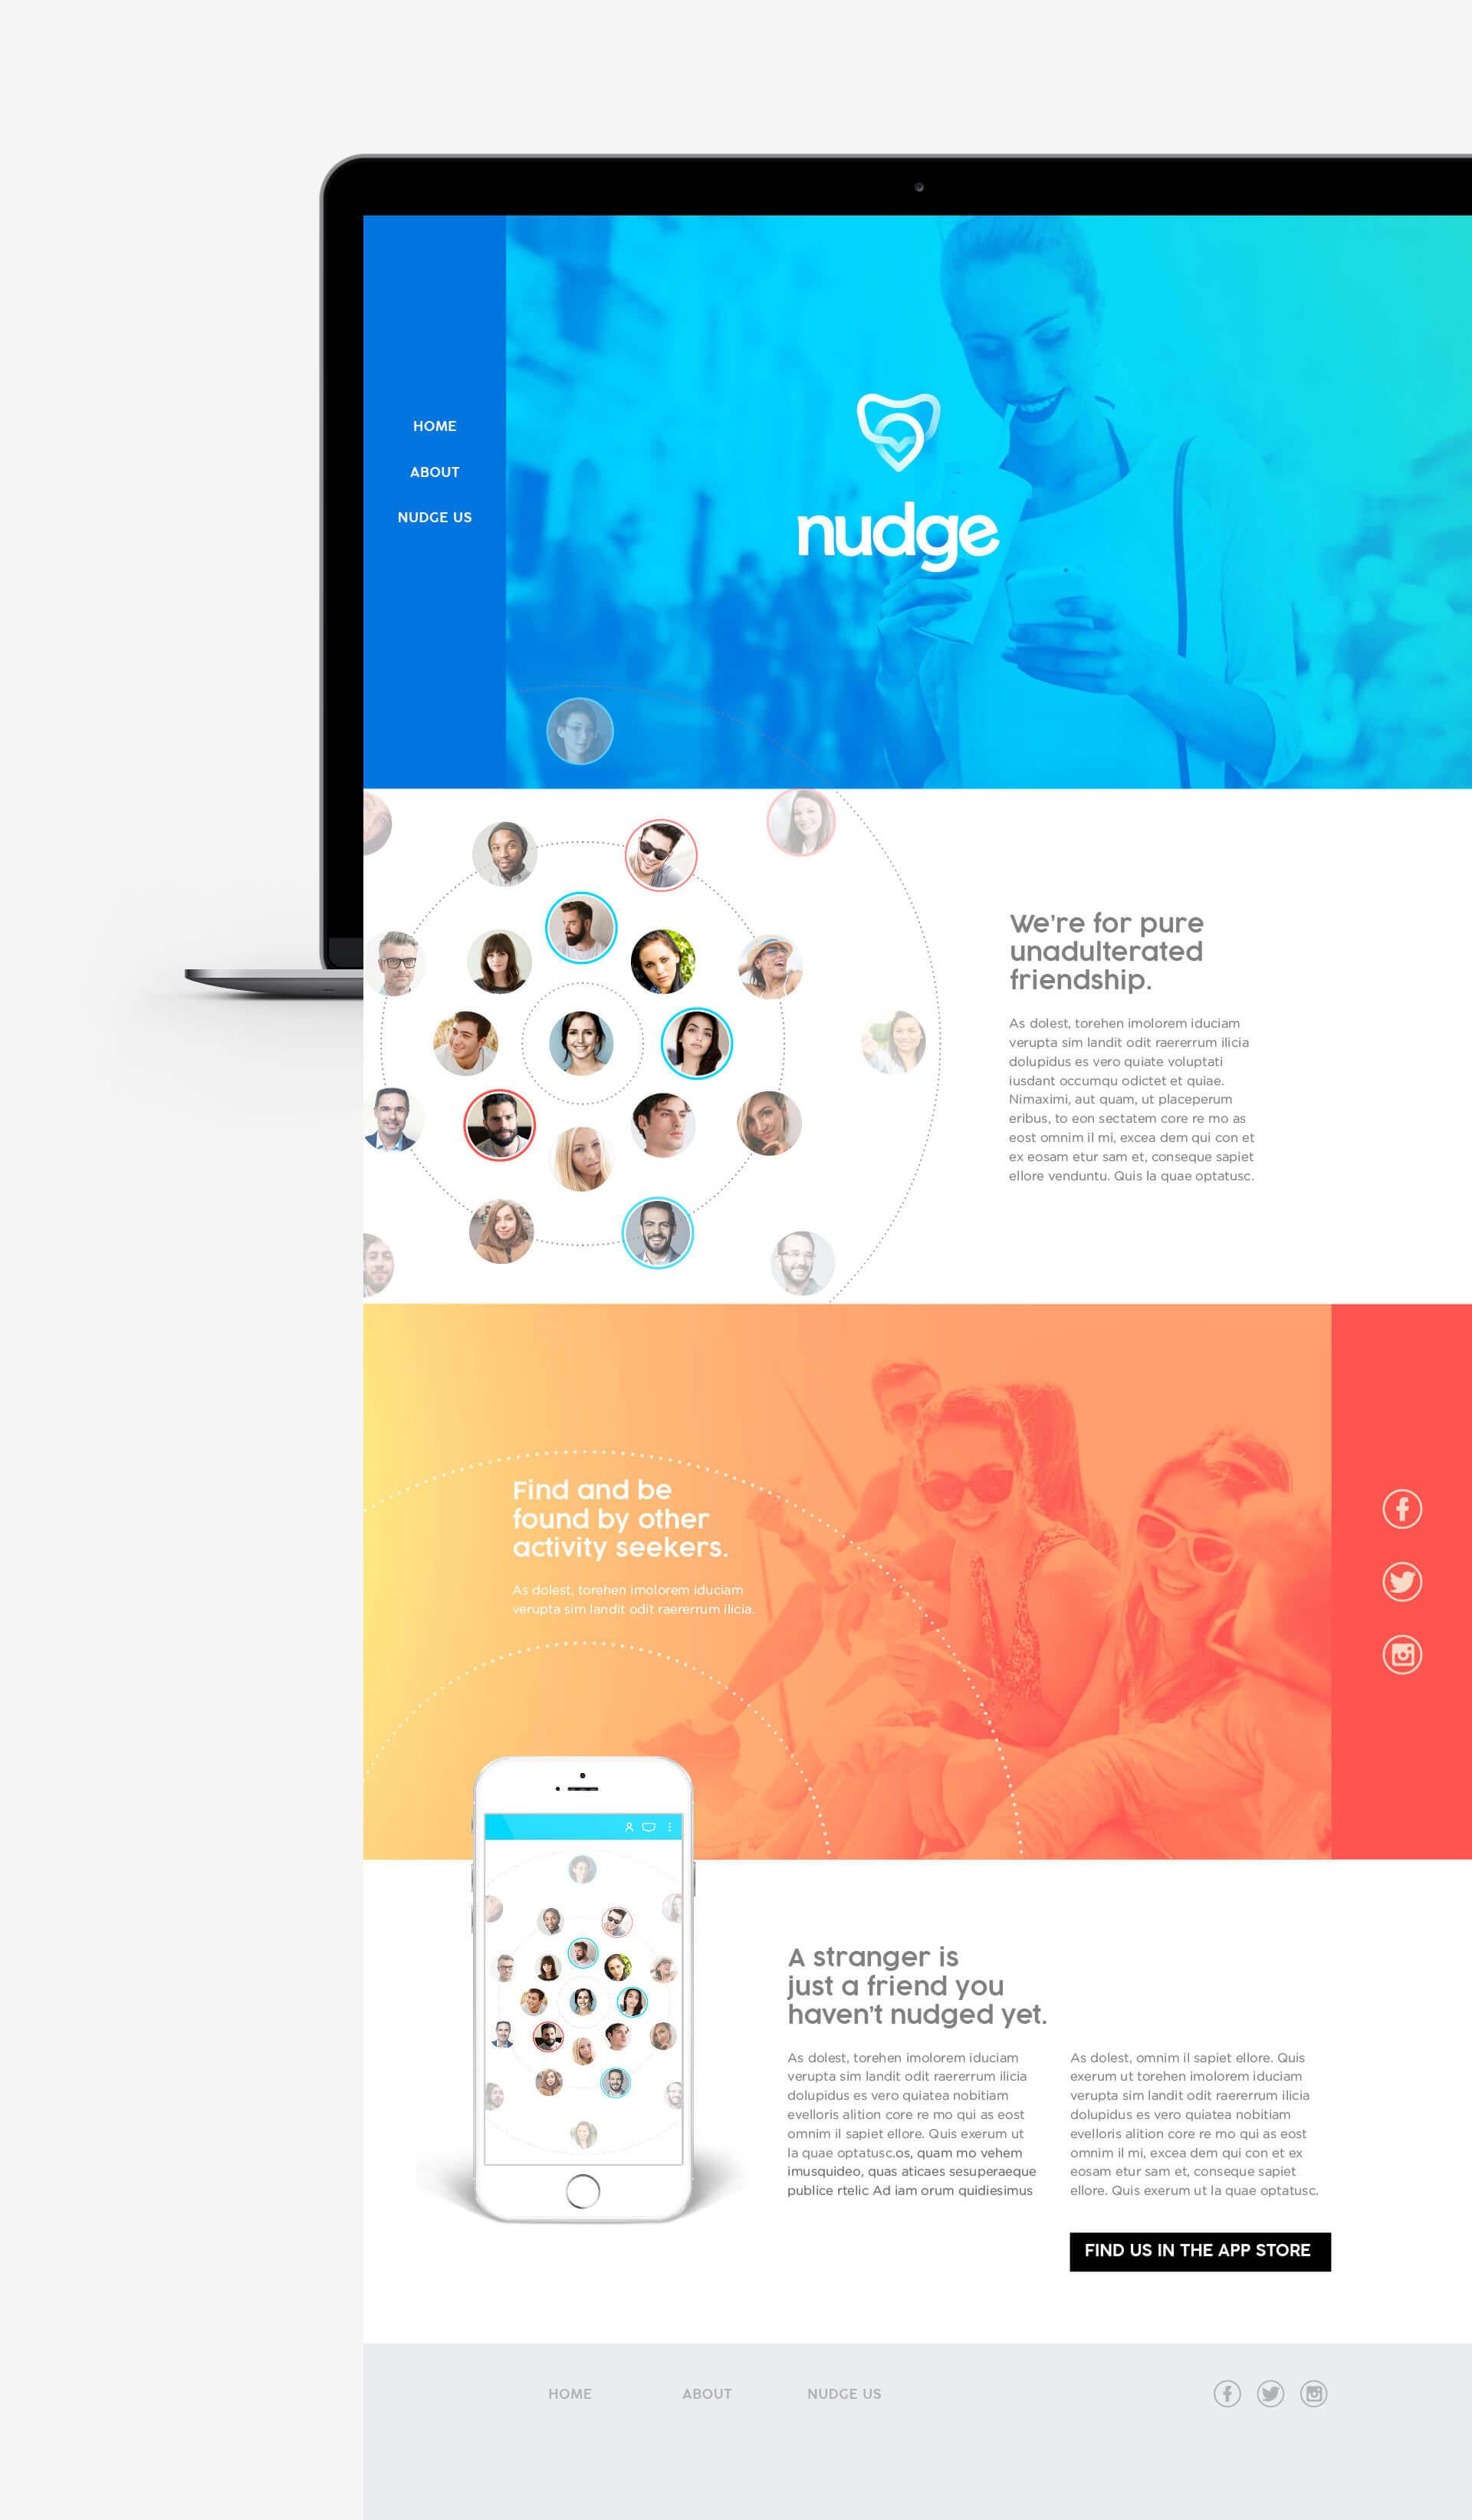 Nudge website homepage design